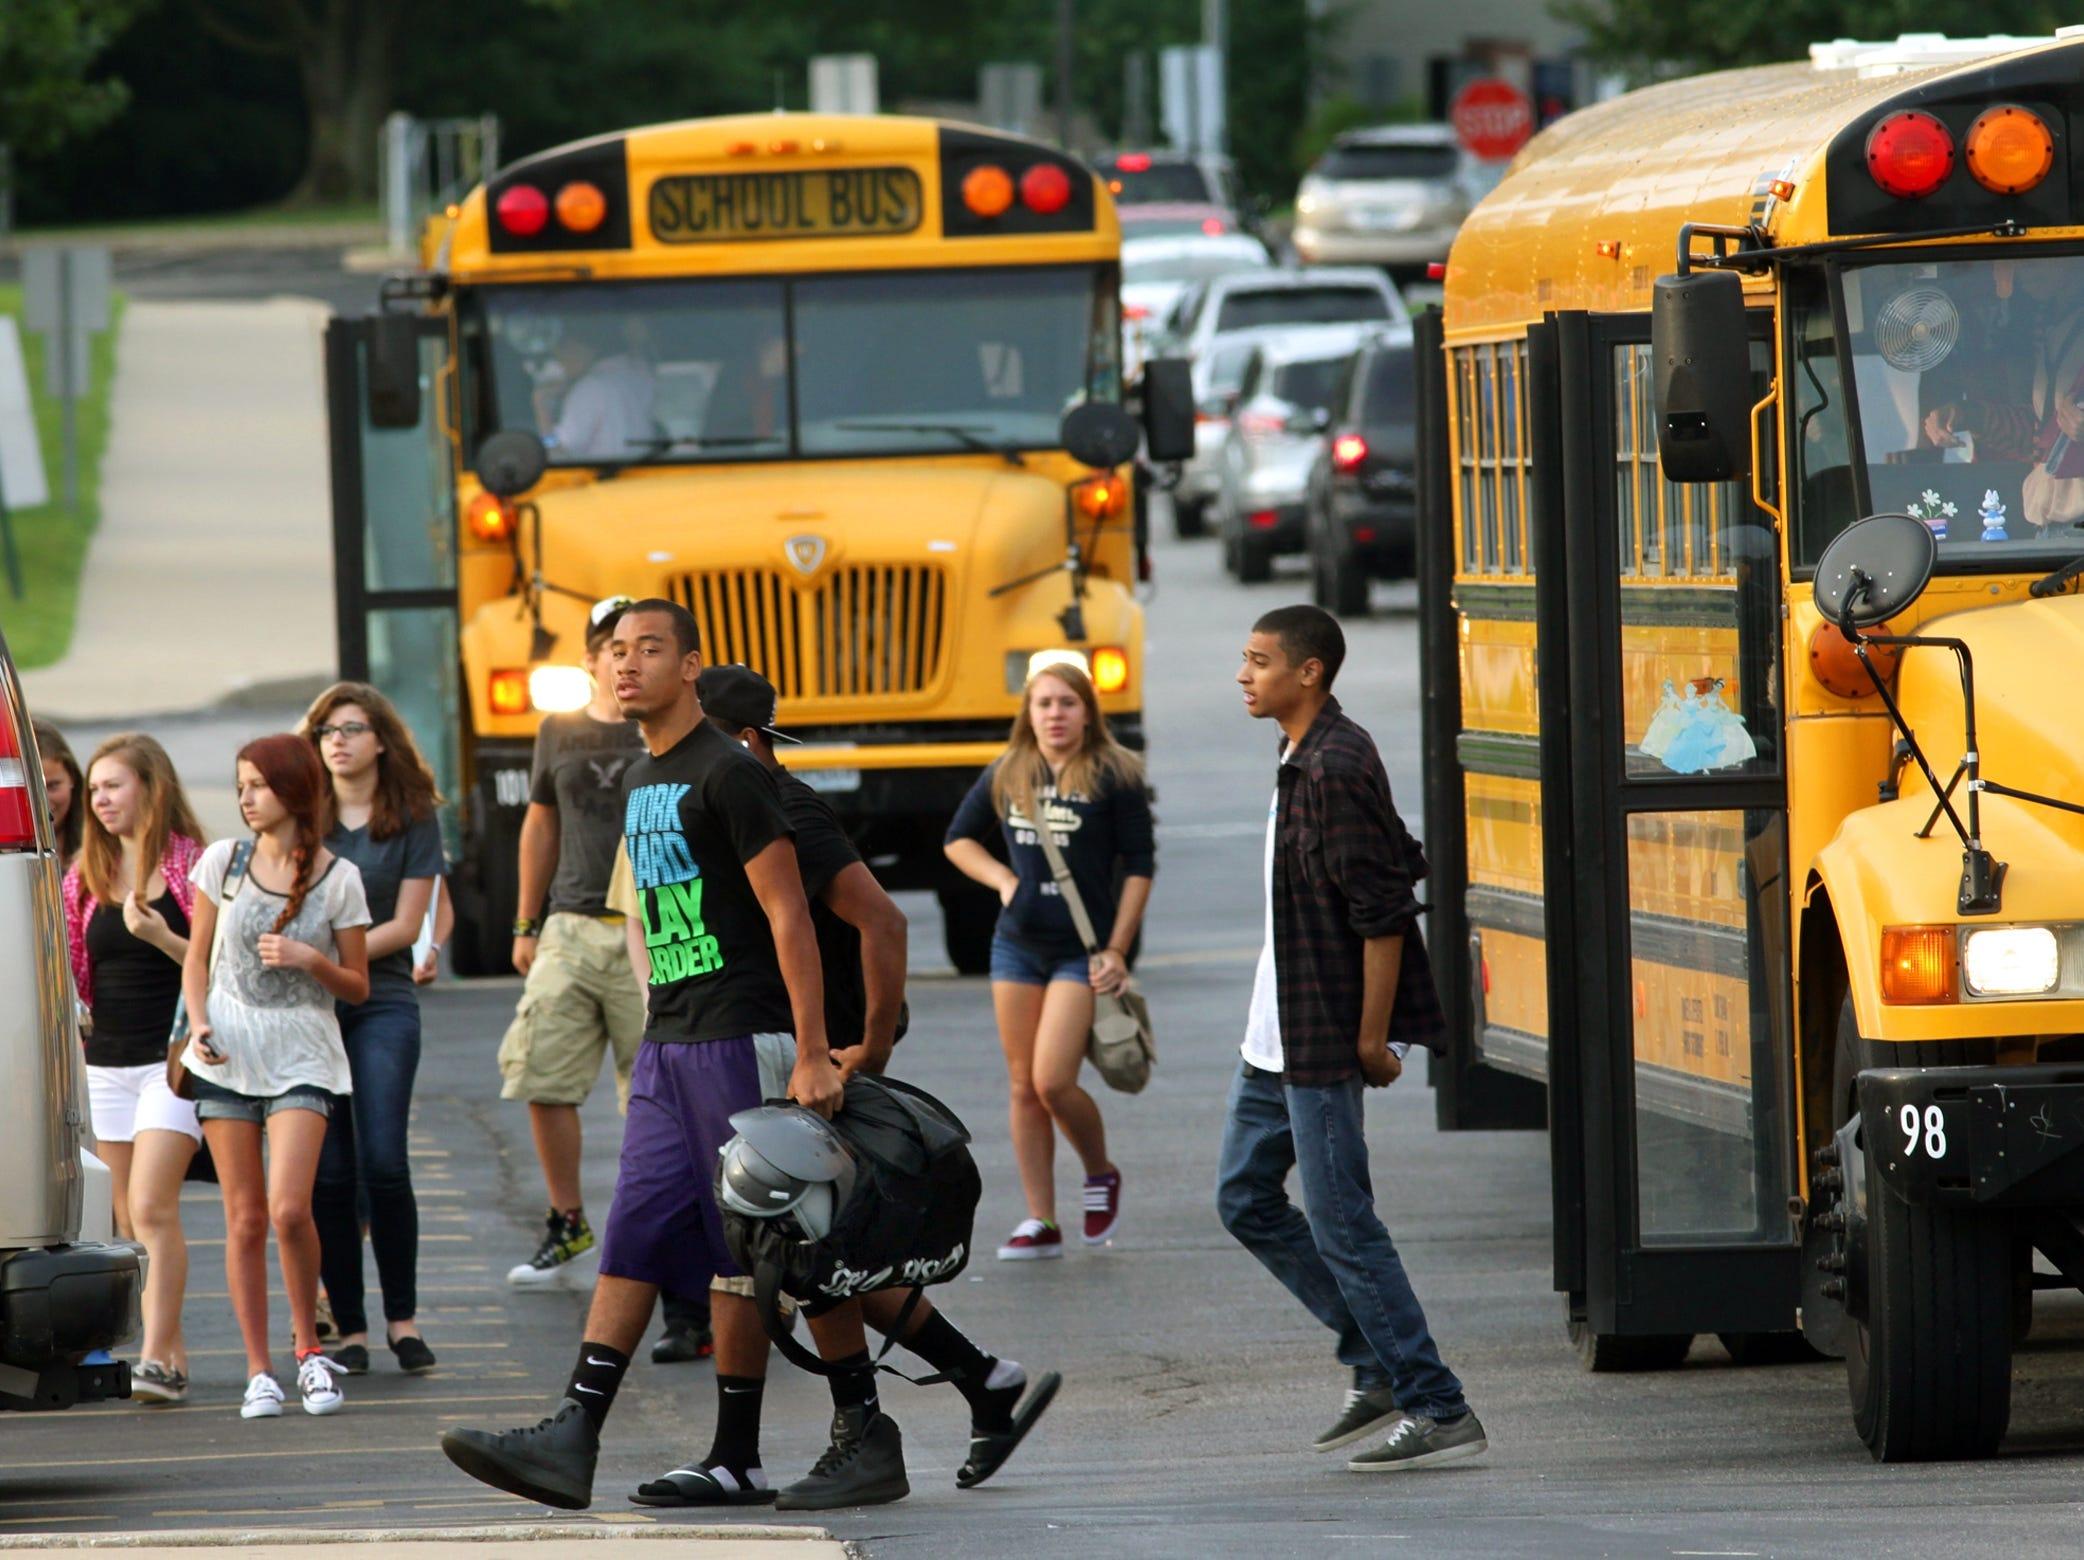 E-transcripts gain favor in high schools